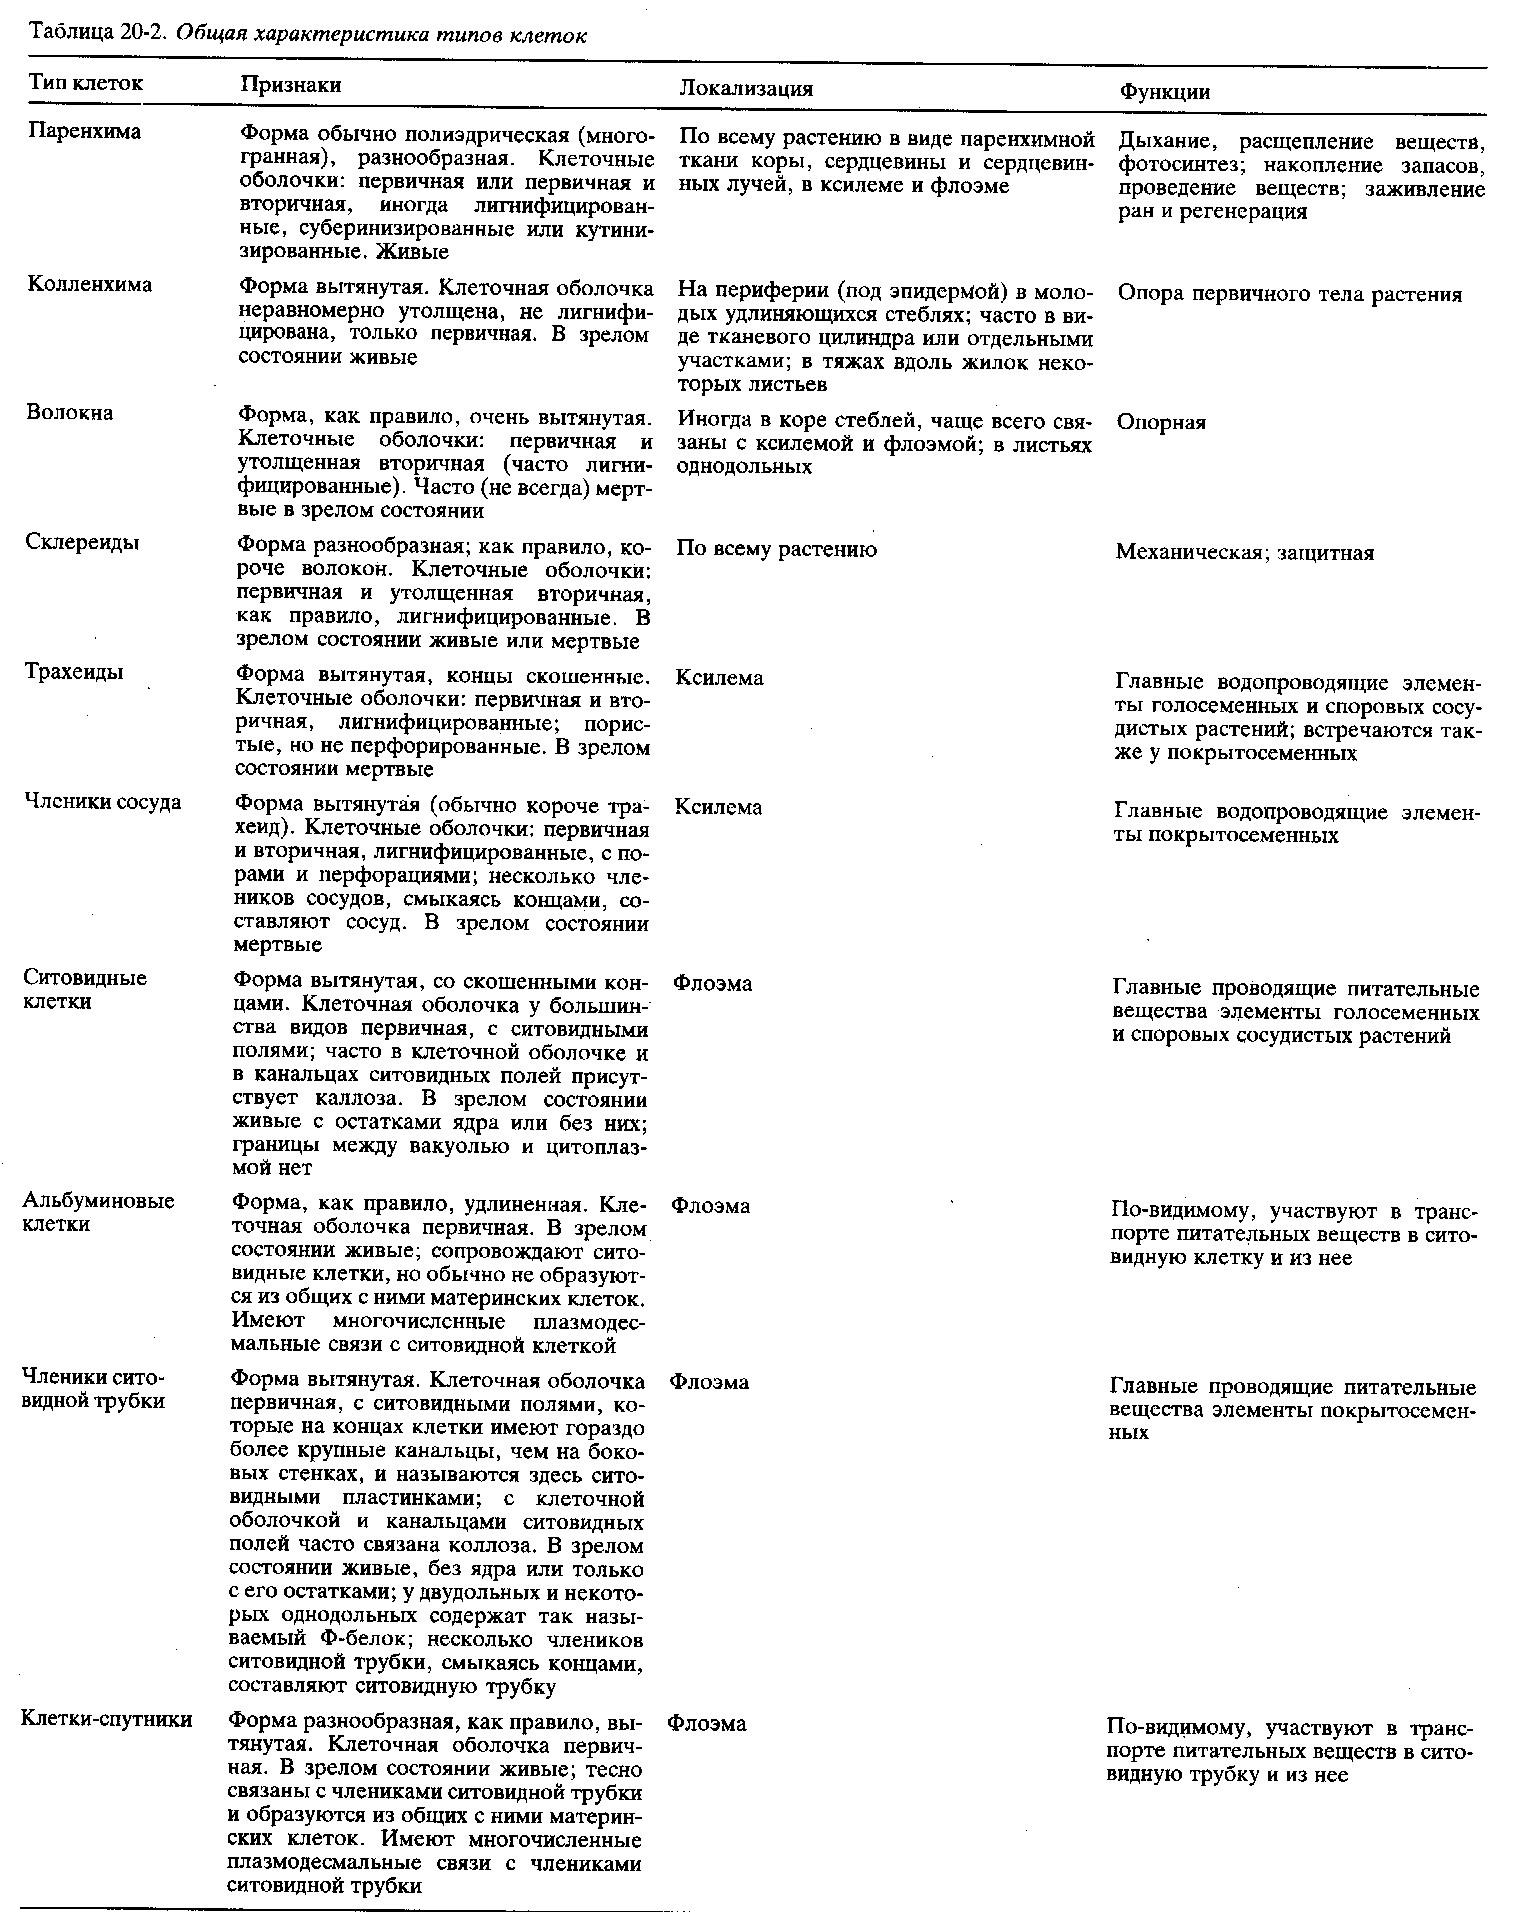 таблица ткани человека 9 класс